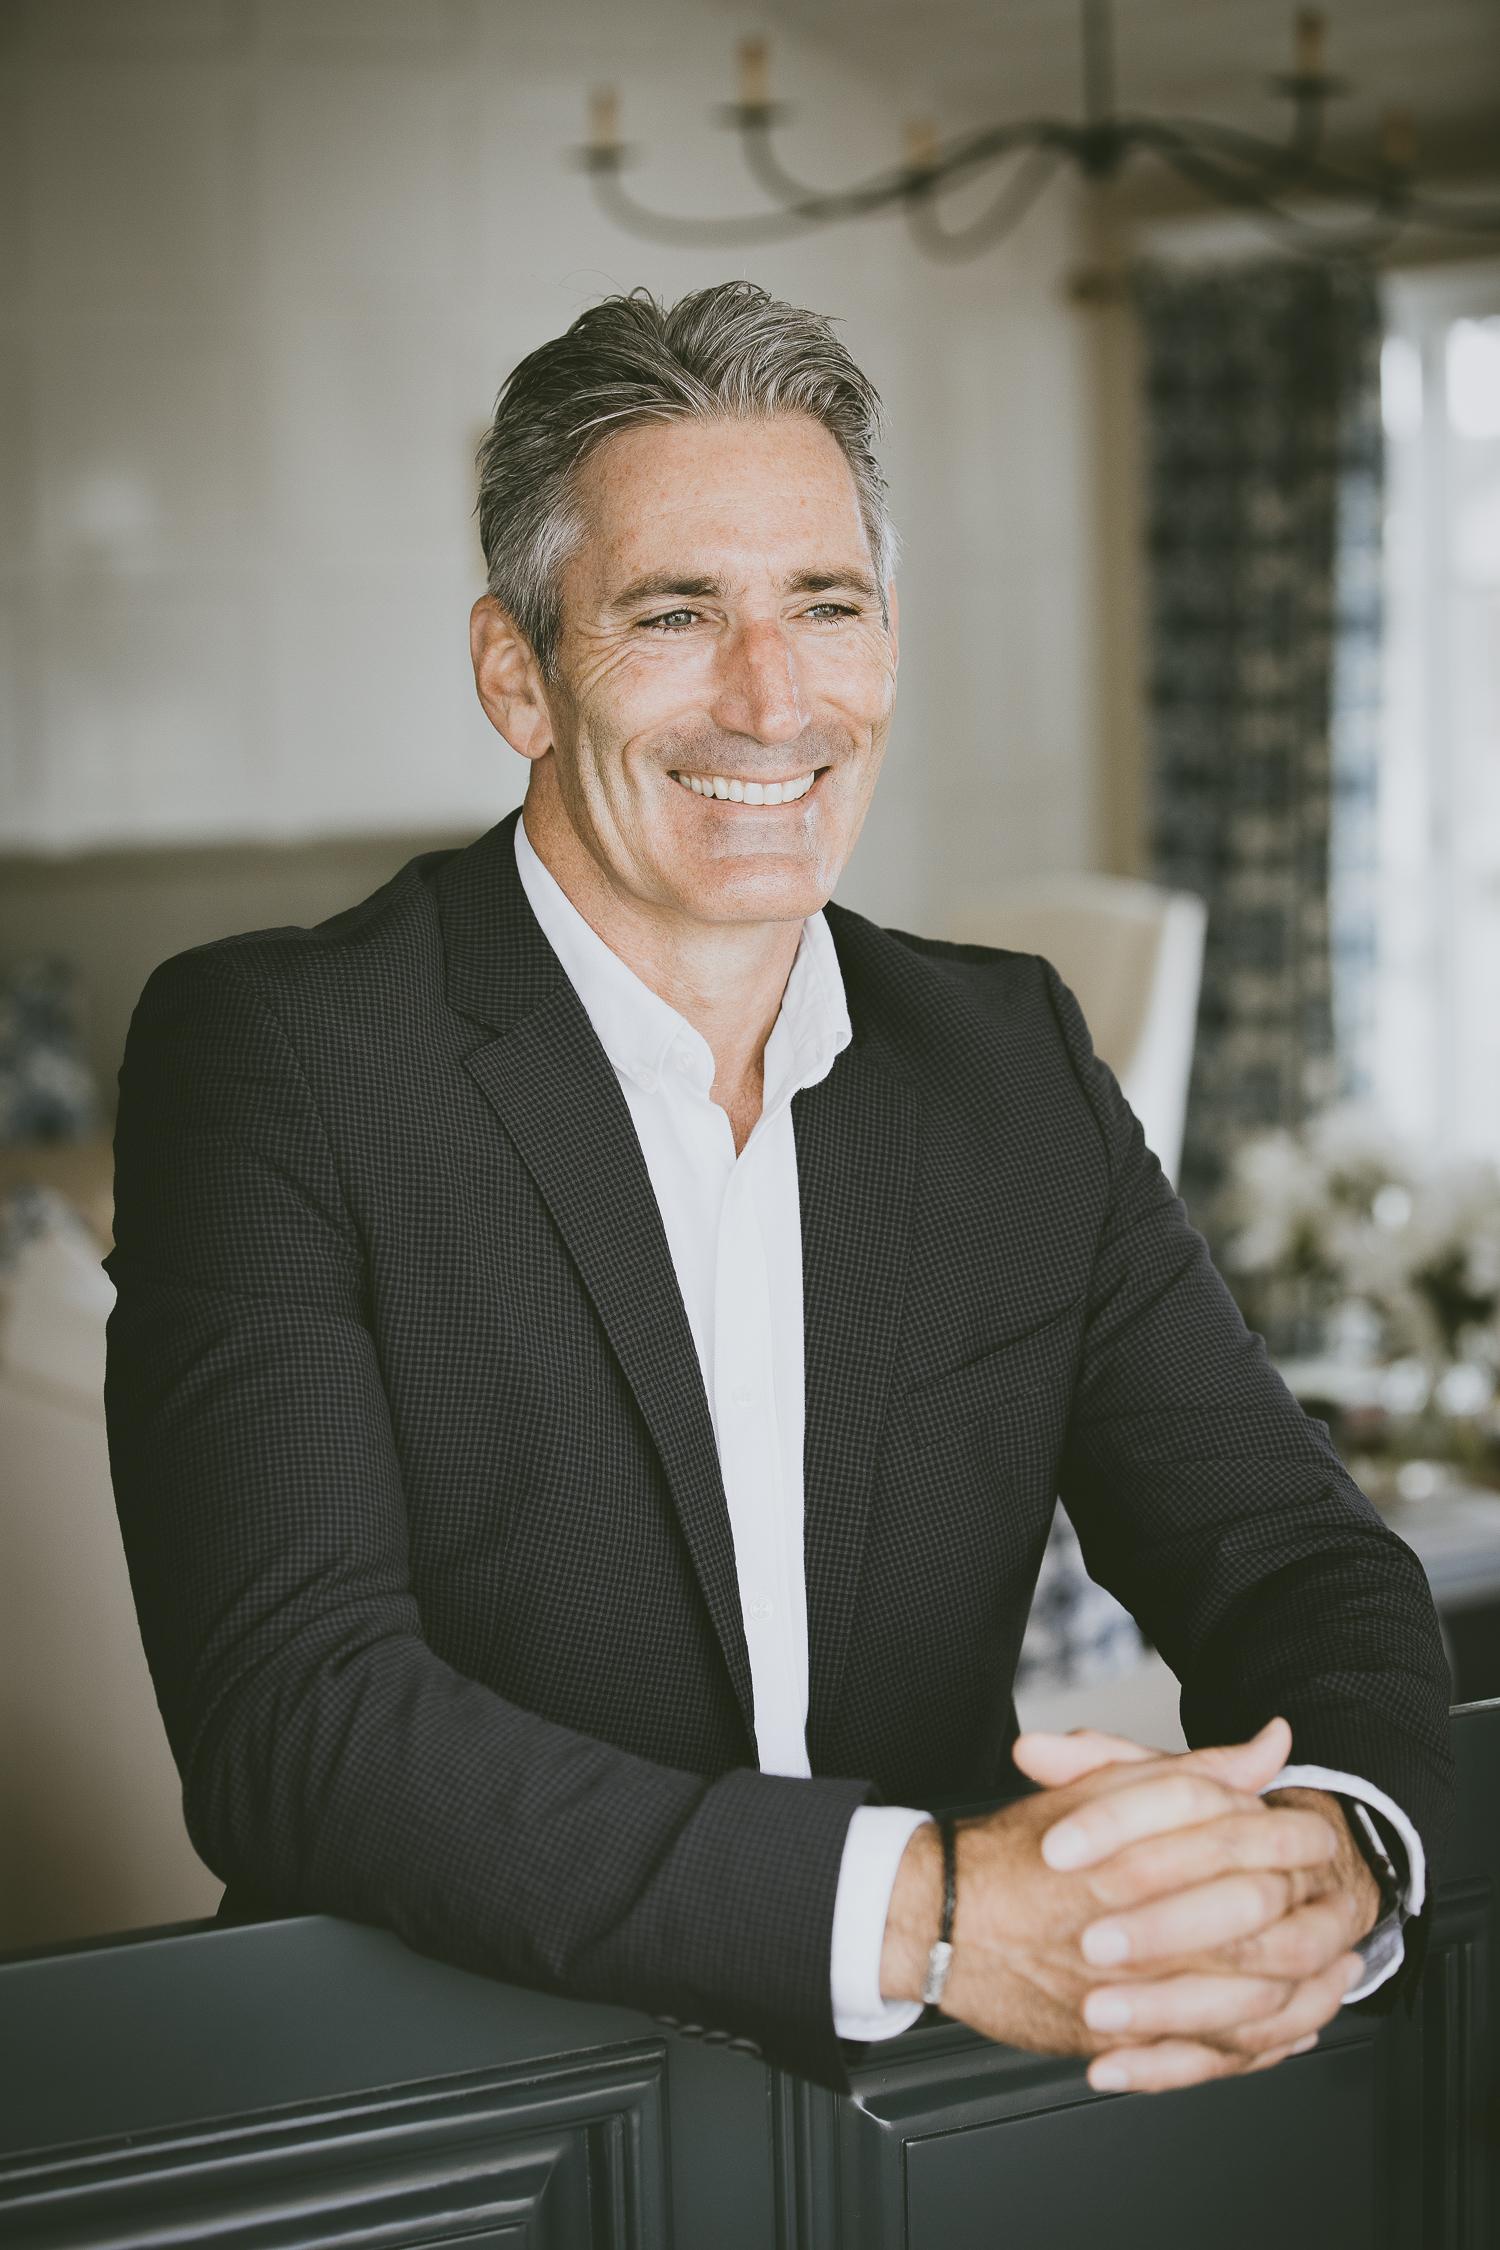 Jon Palmieri Compass Coronado Lifestyle Headshot